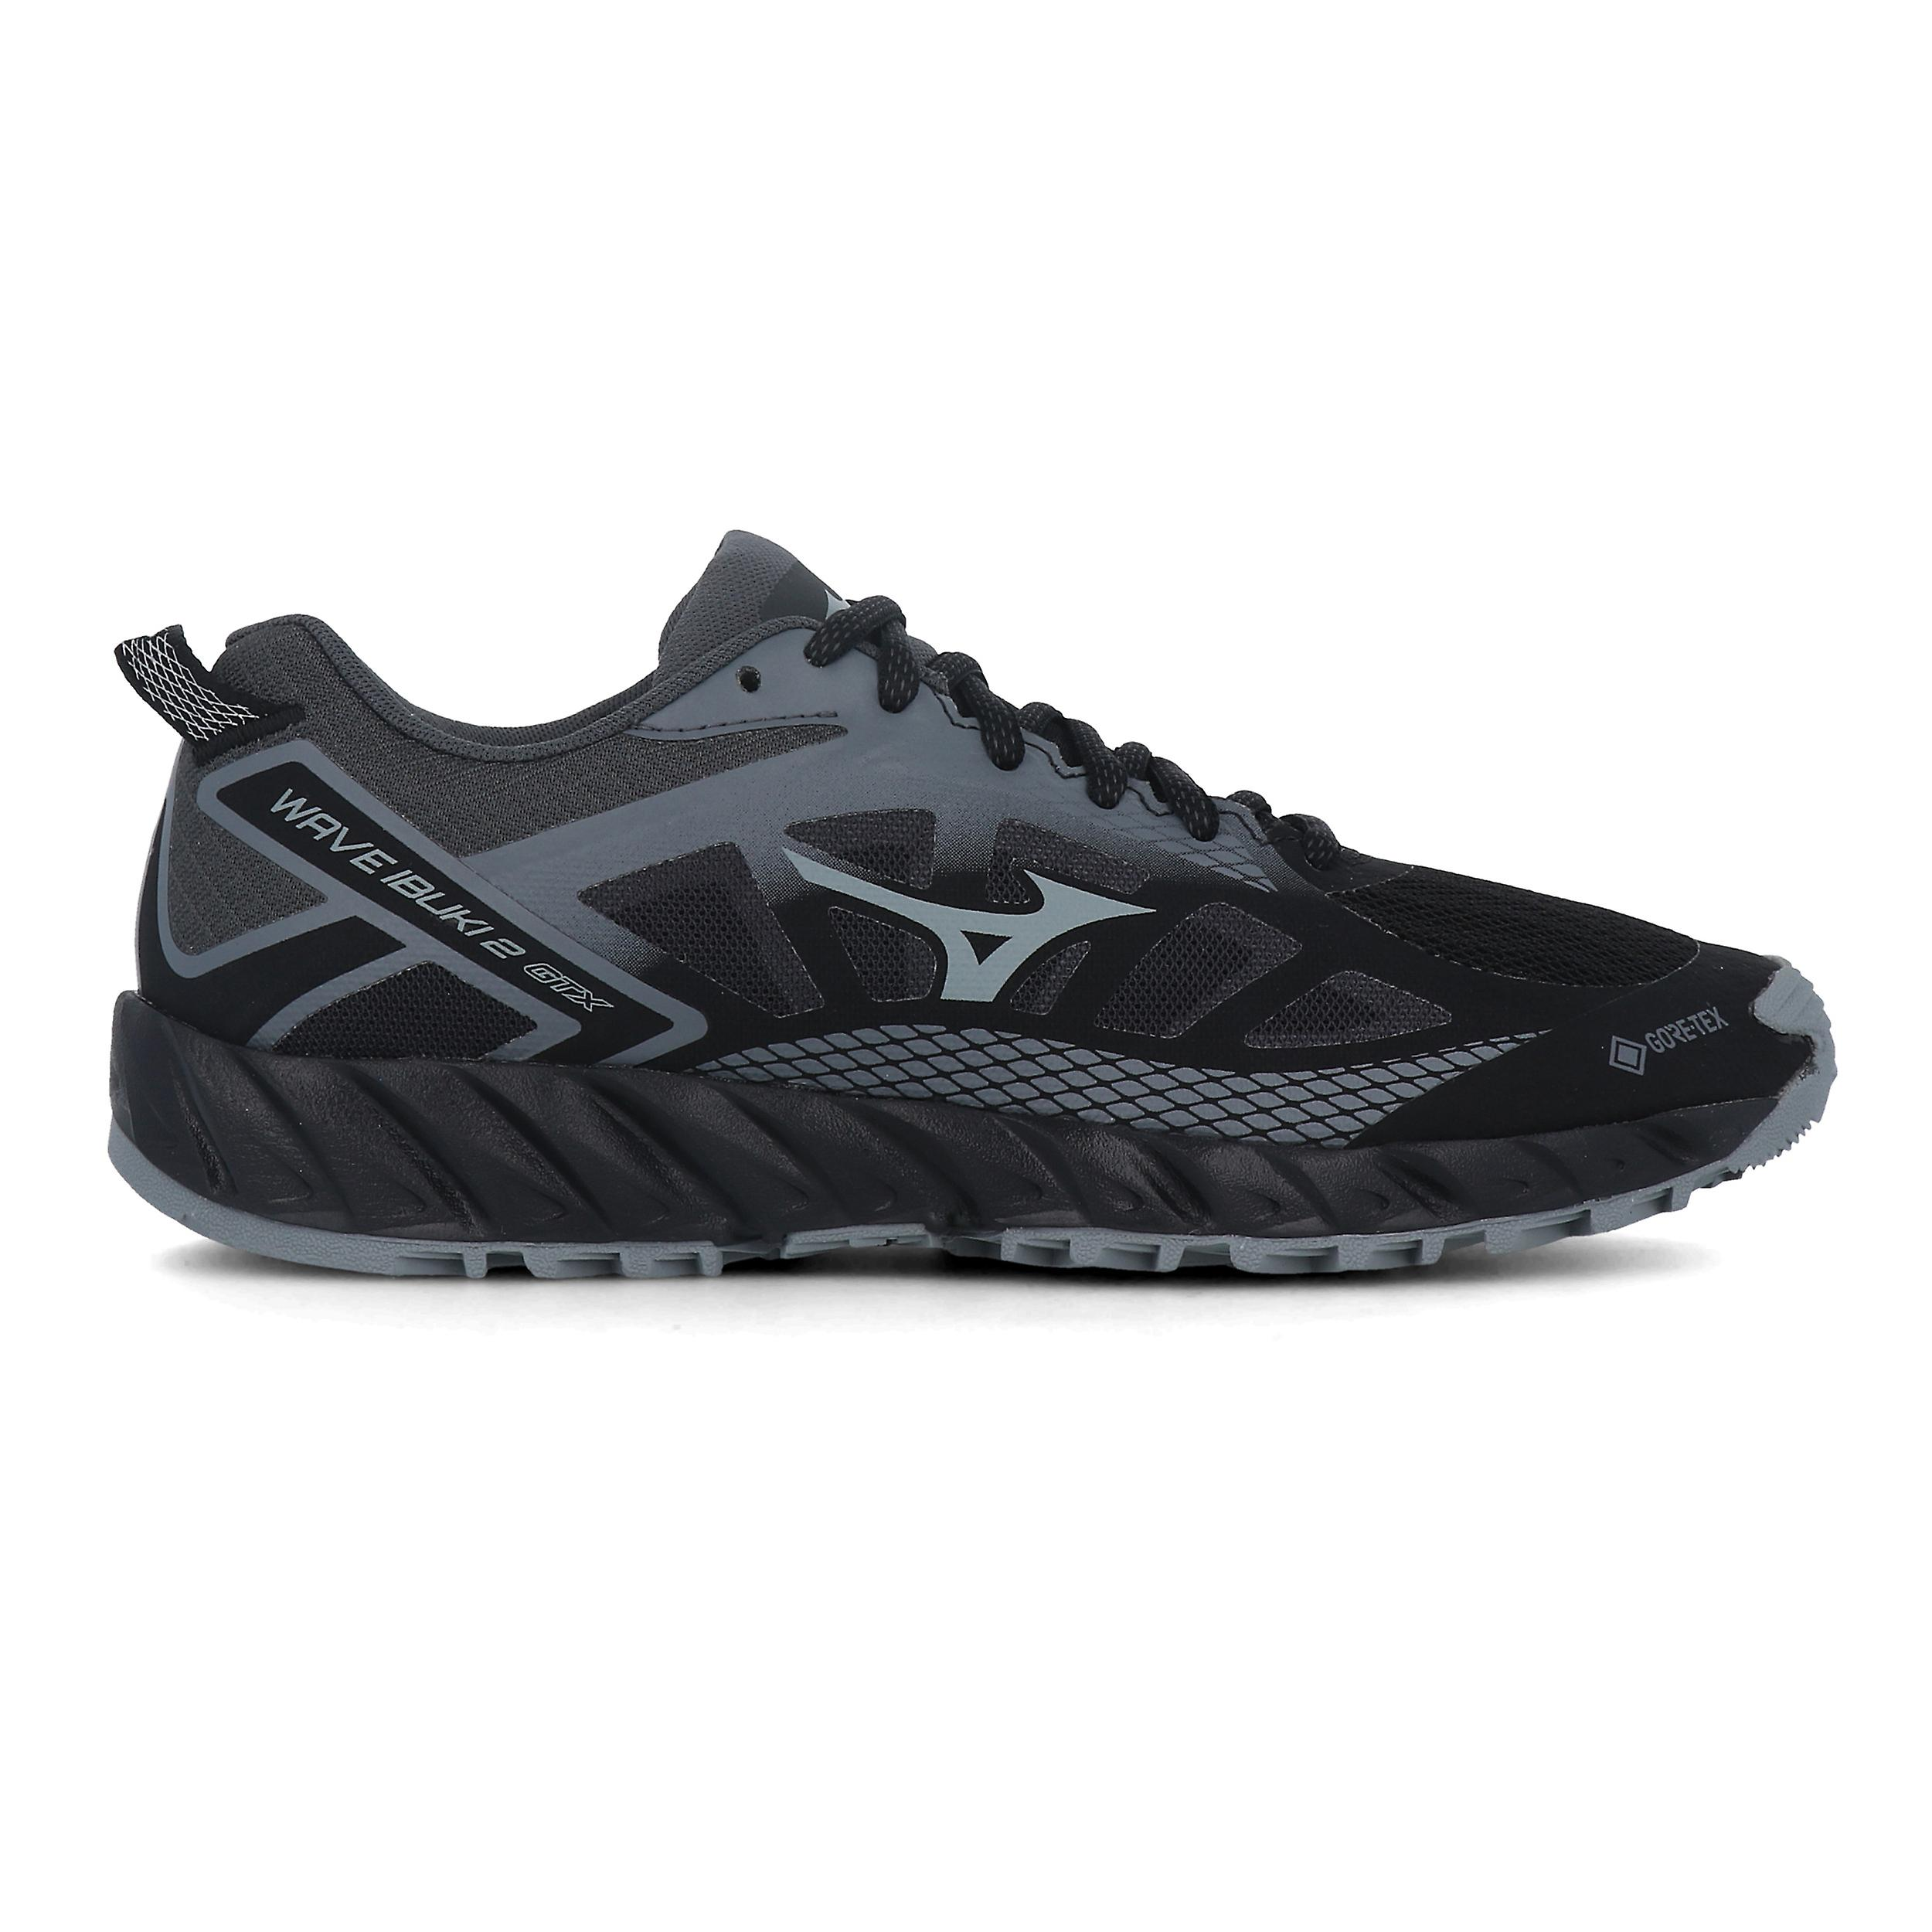 Mizuno Wave Ibuki 2 GORE-TEX Women's Trail Running Shoes - SS20 G0cQh